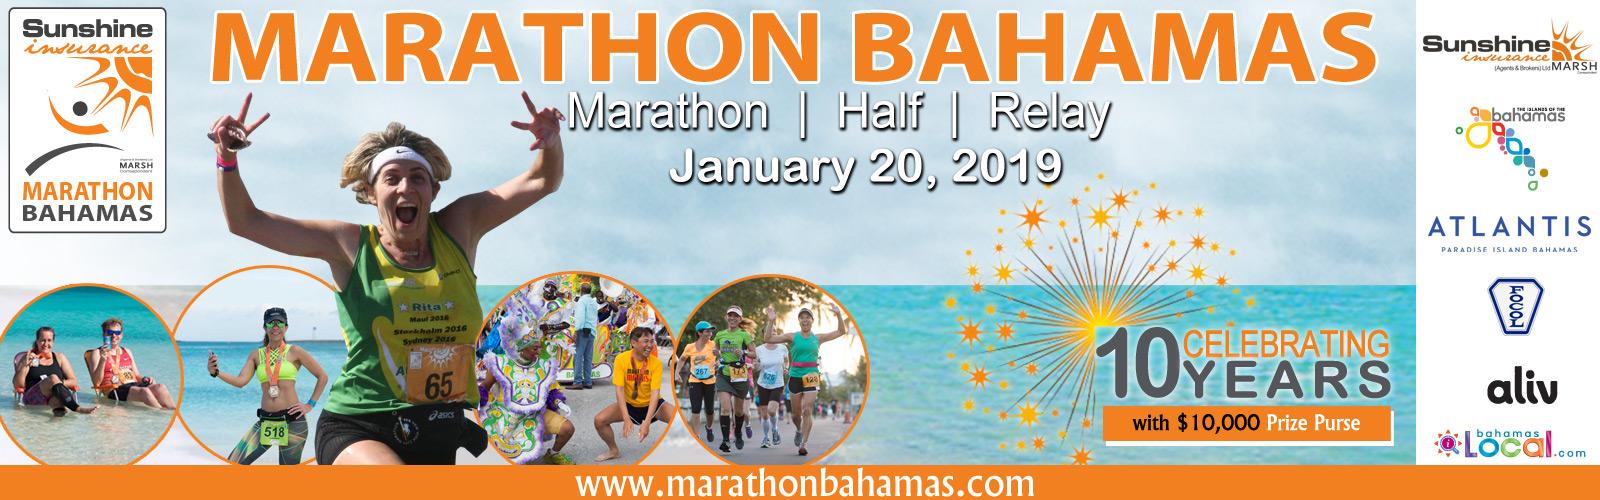 Sunshine Insurance Marathon Bahamas Race Weekend